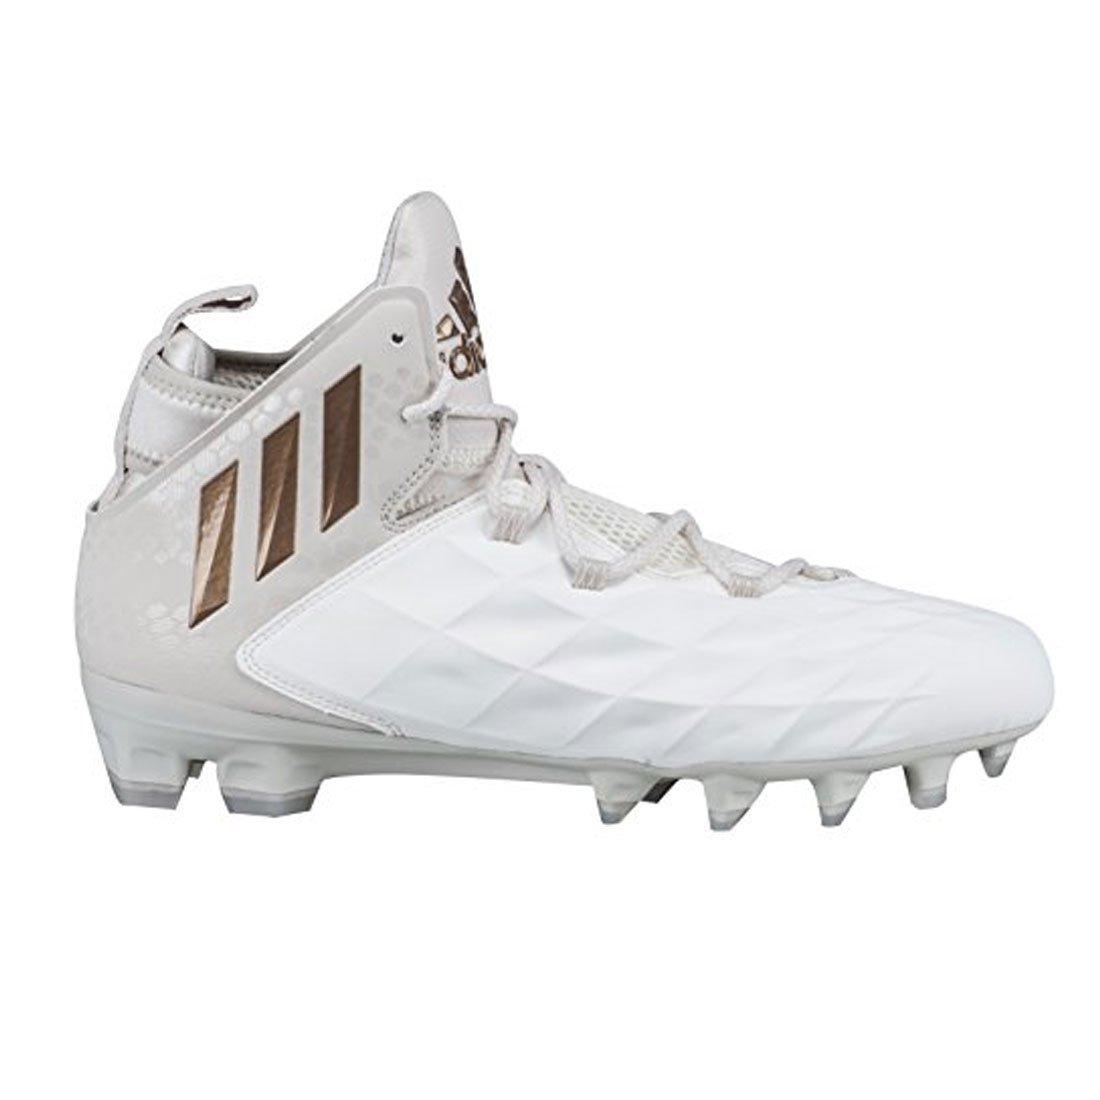 Adidas Freak Lax Mid Lacrosse Cleats-Chalk/White-11.0